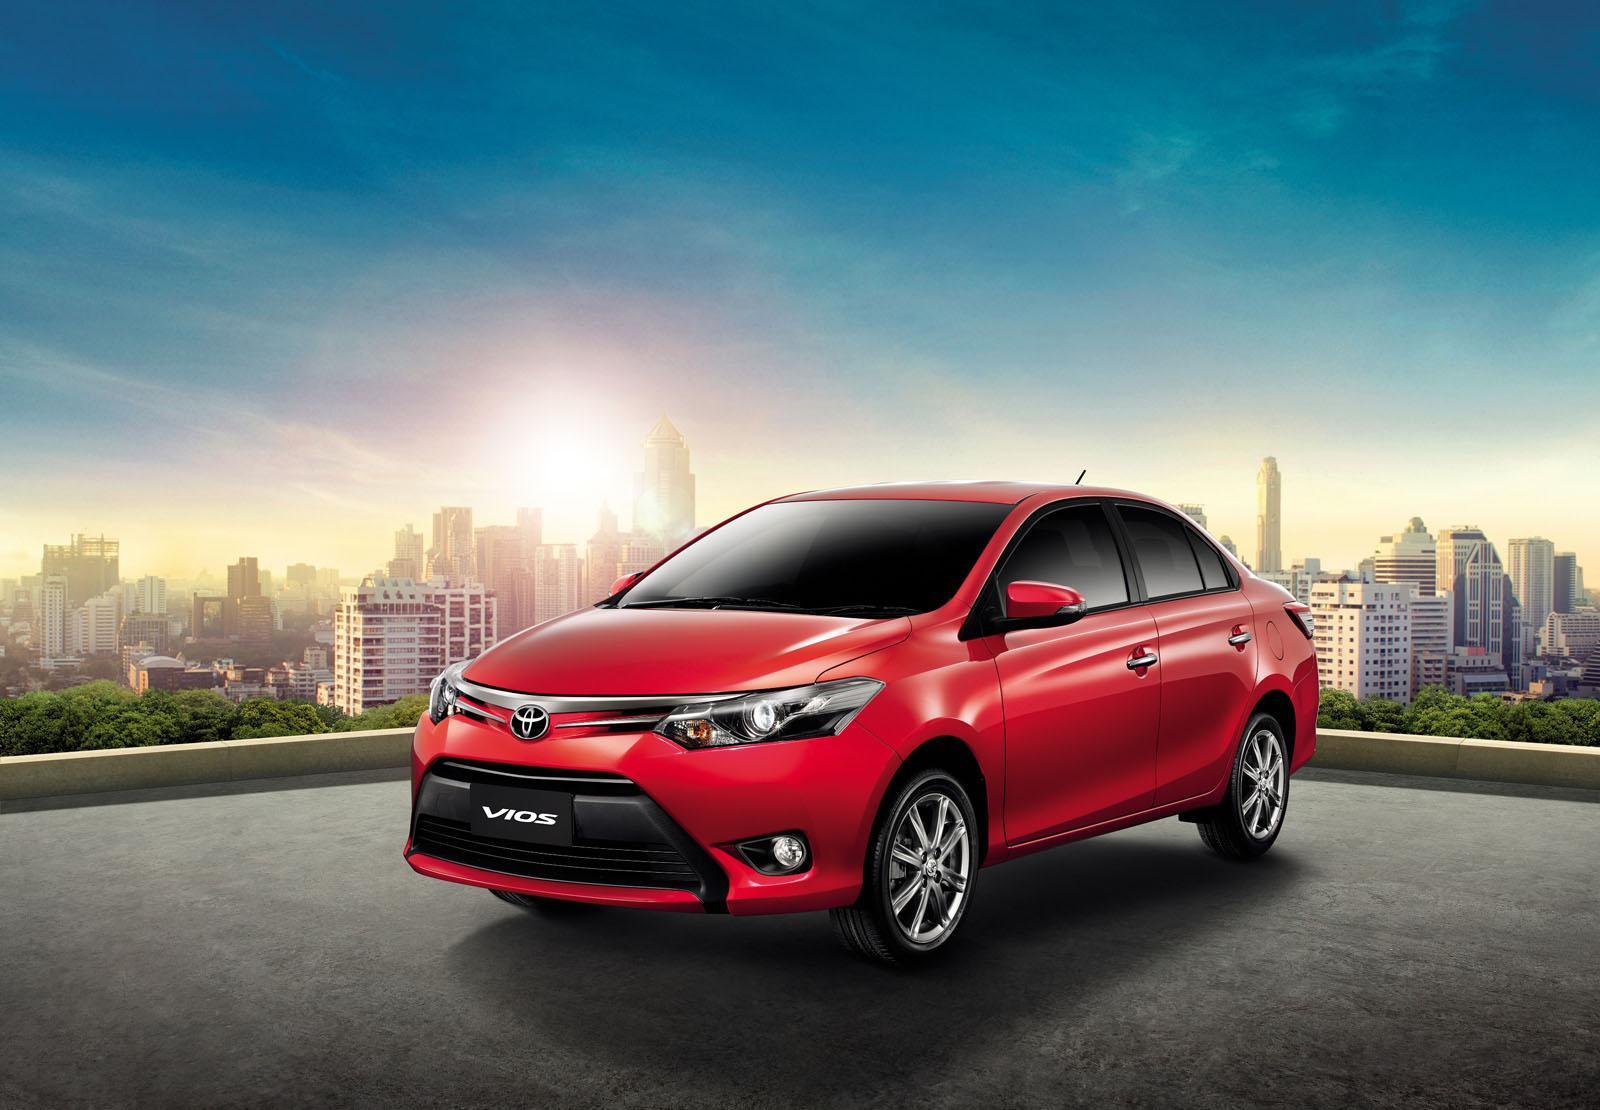 novo Toyota Vios 2014